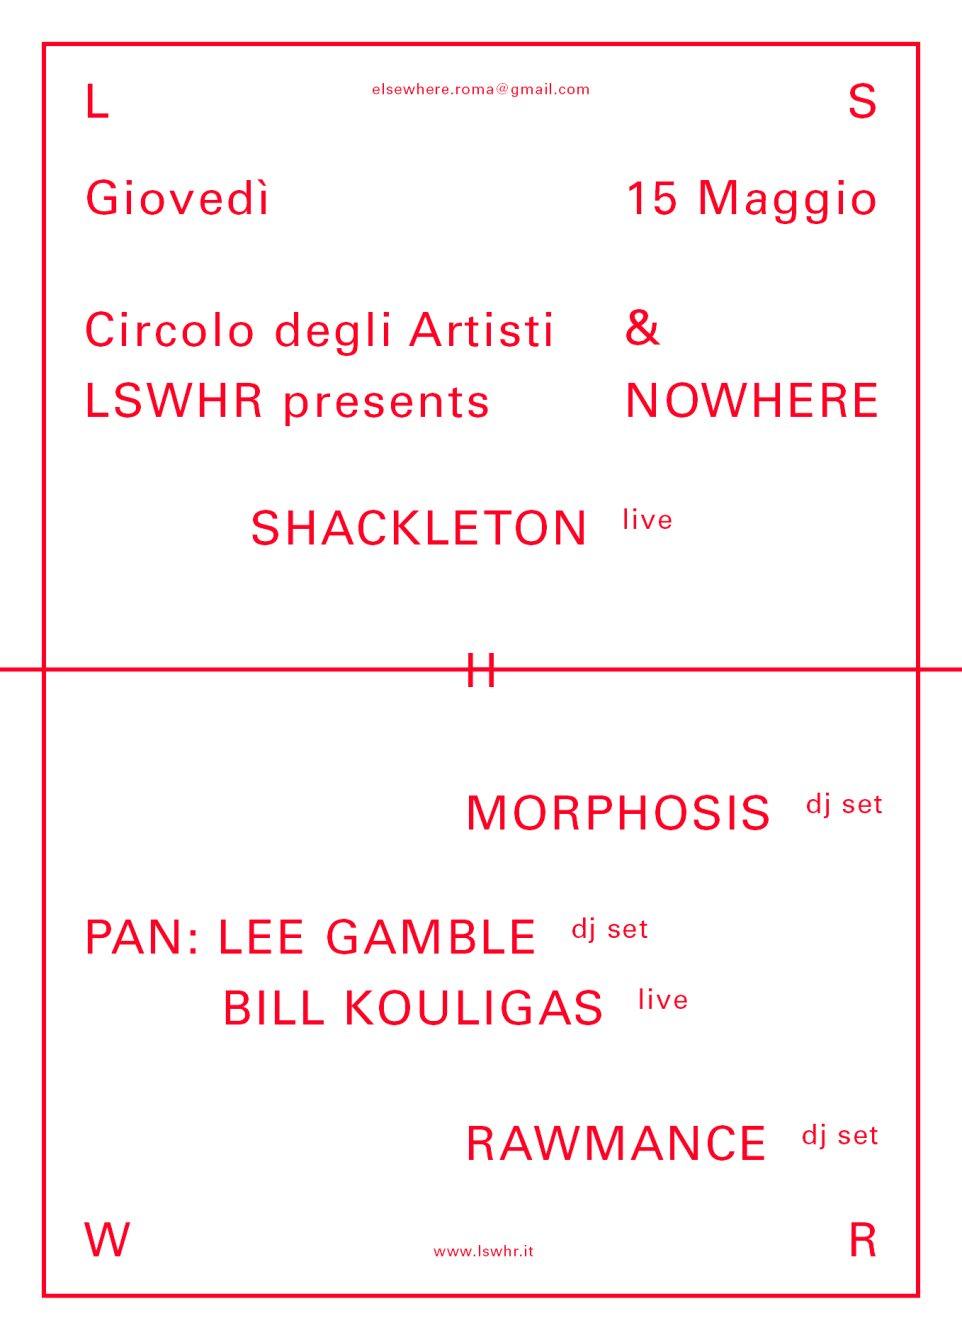 Nowhere Festival a Roma, con Shackleton e Morphosis